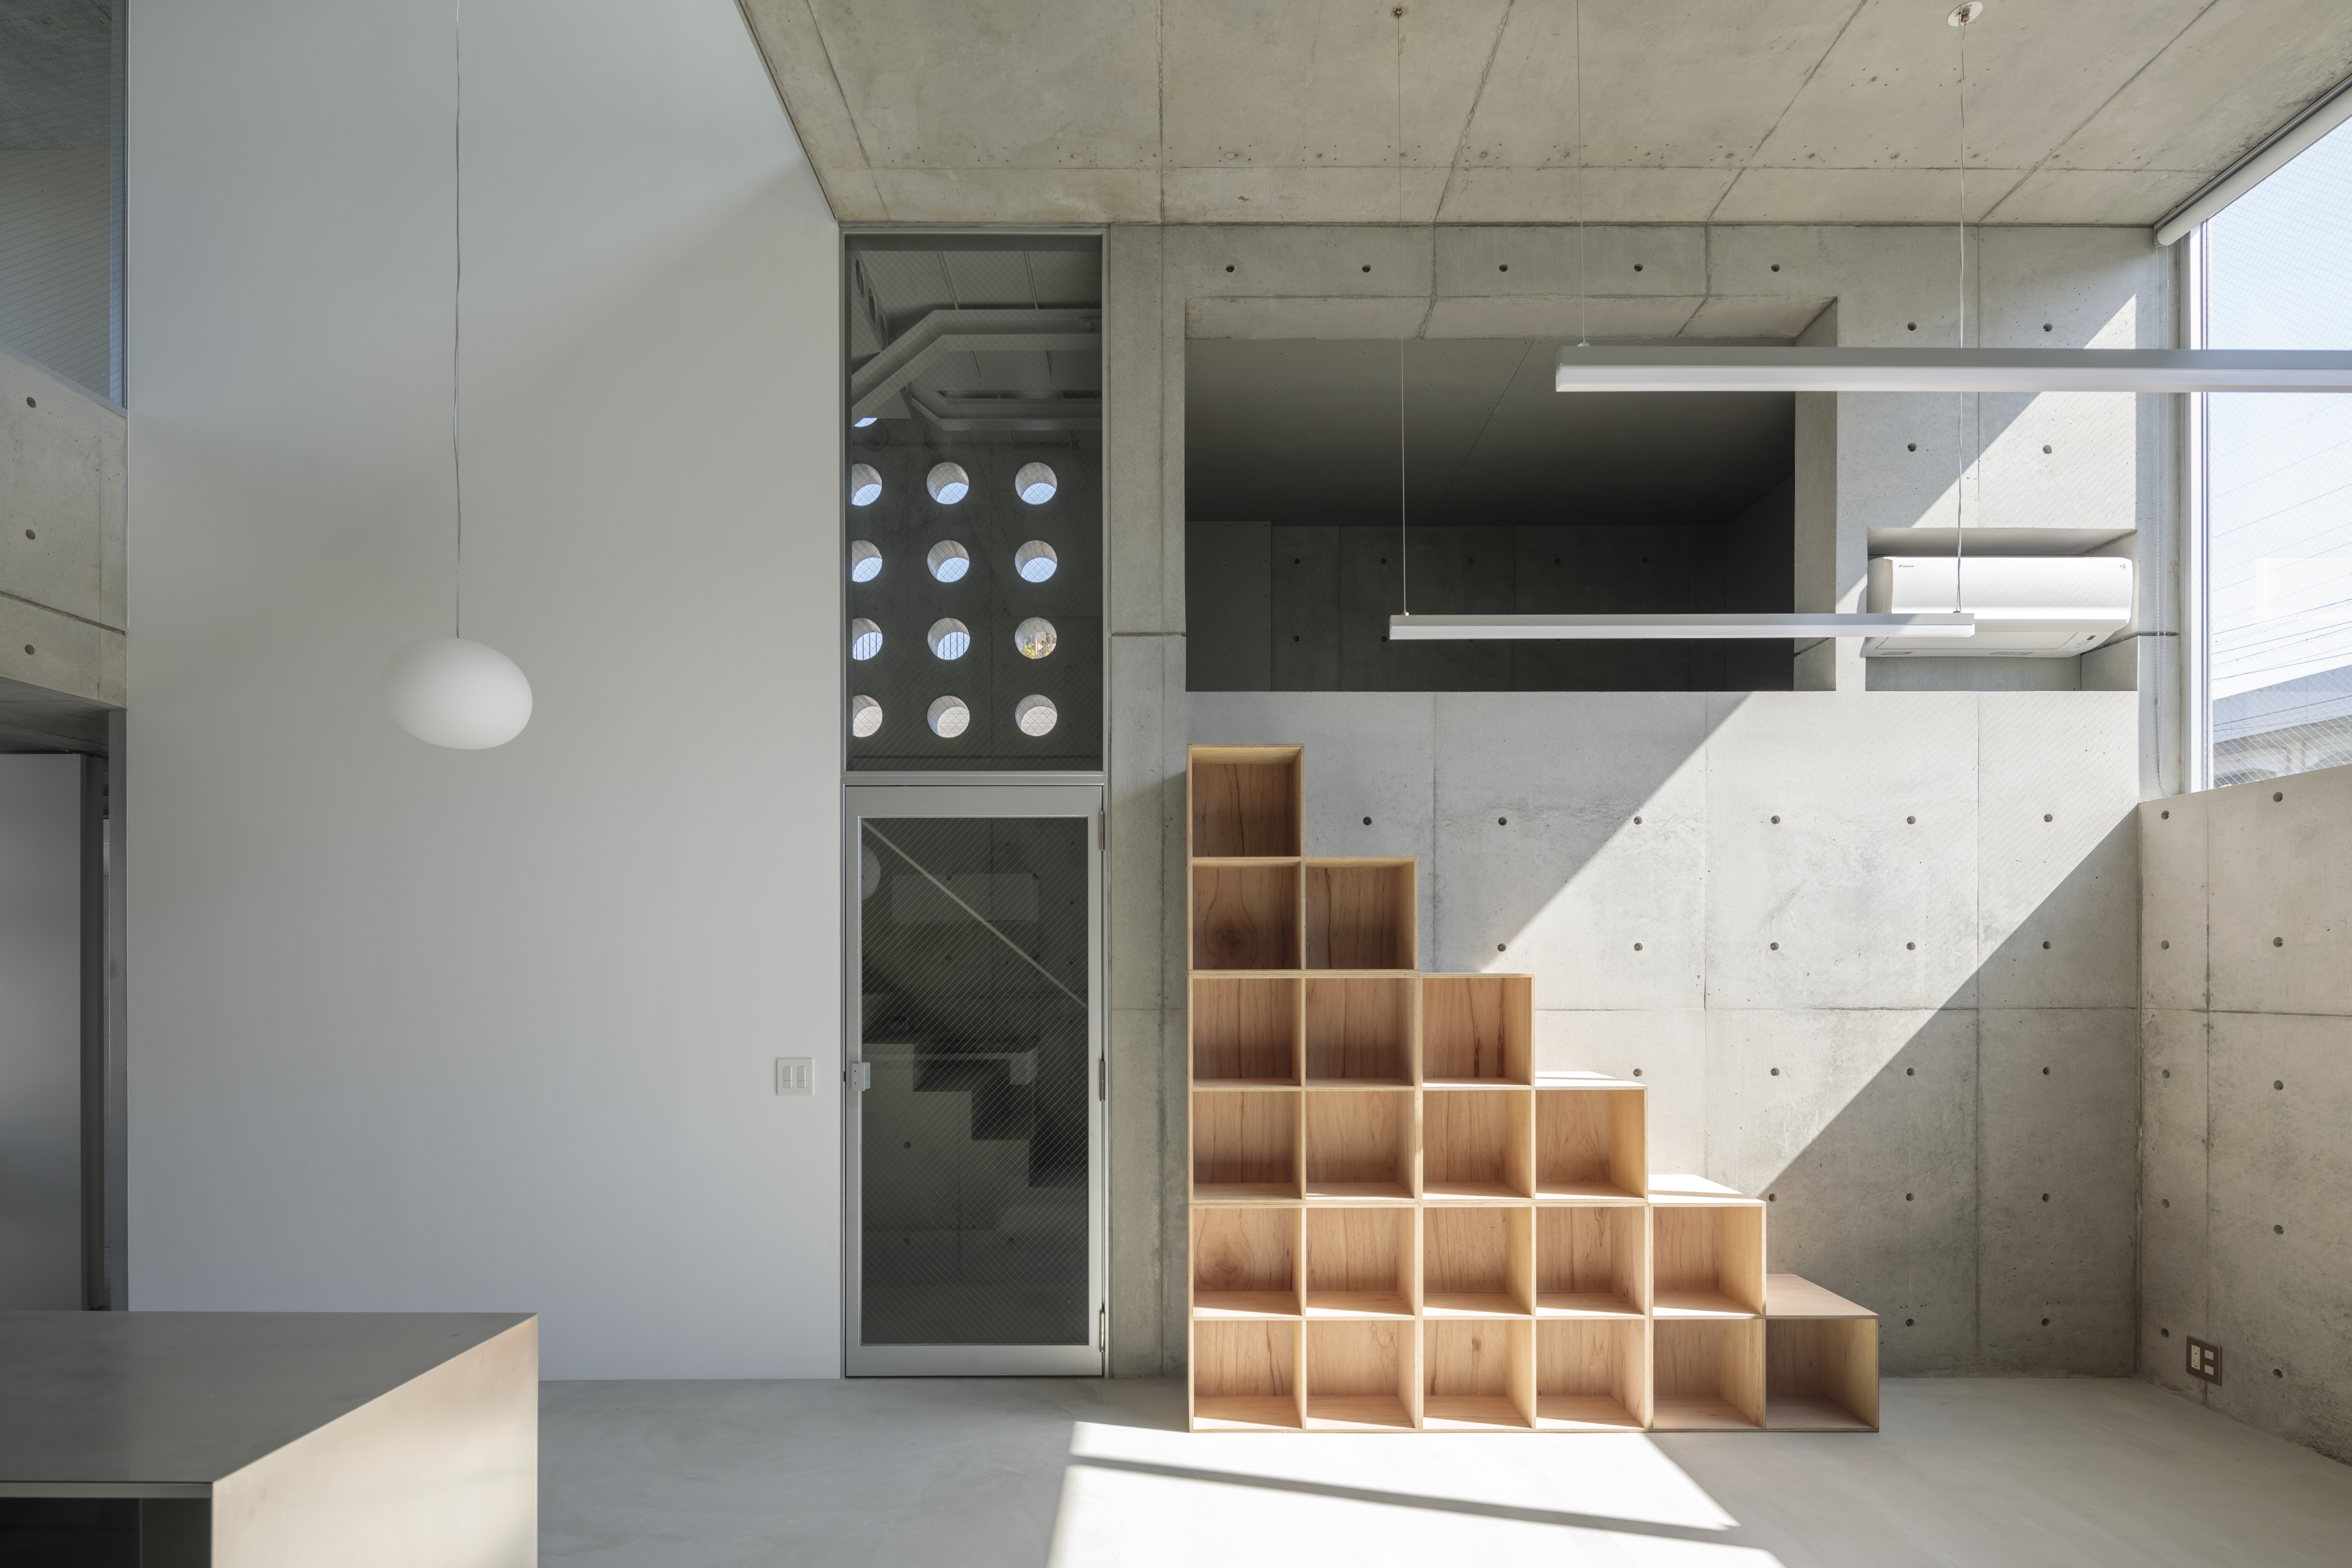 Atelier in Hakushima 06